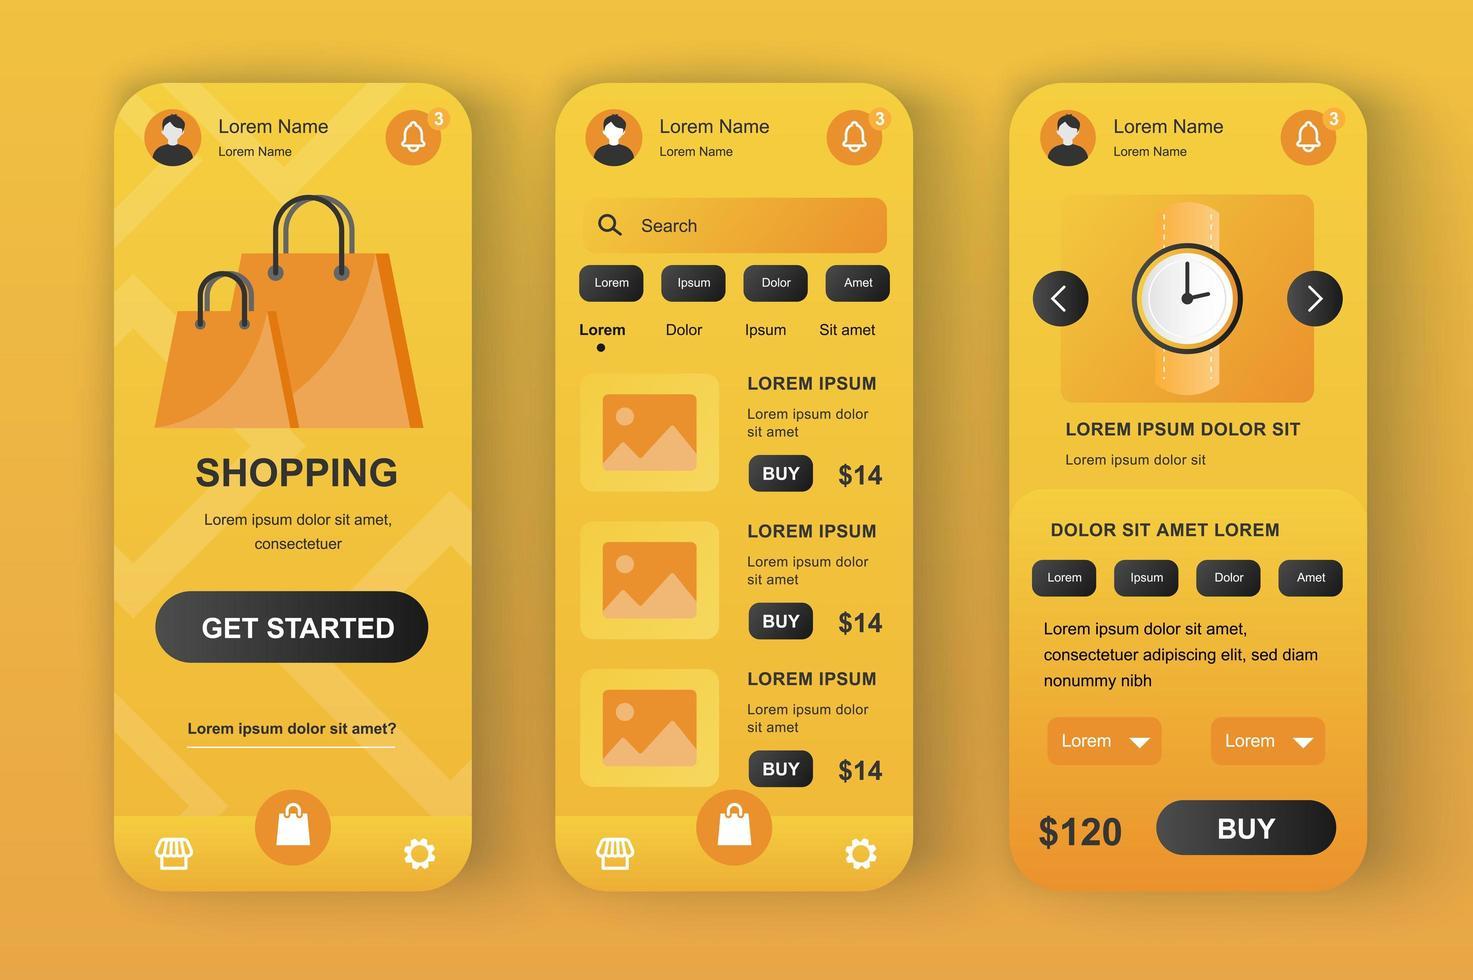 shoppinglösning, unikt neomorf design kit vektor